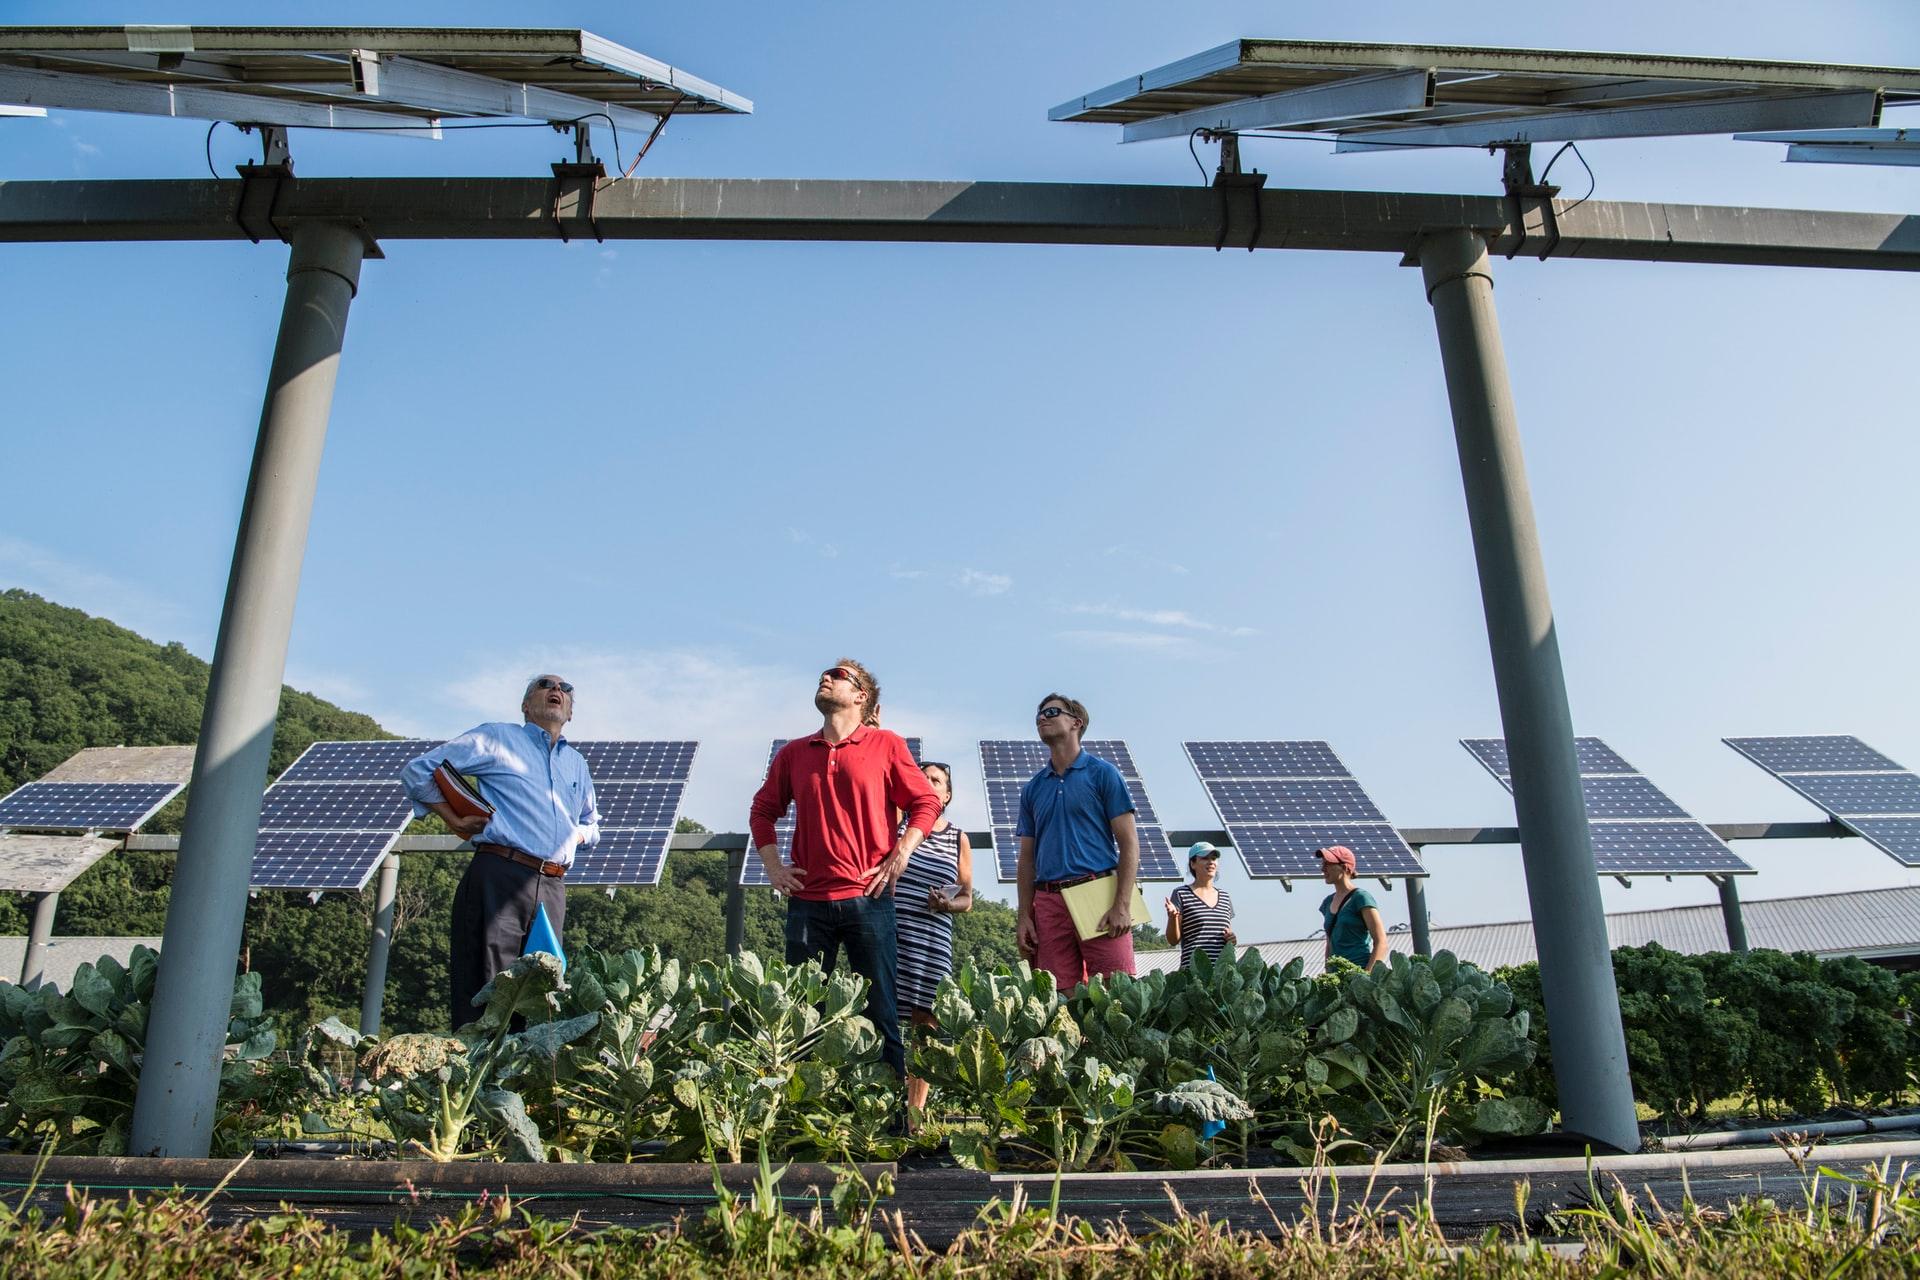 fotovoltaico lavoro jobs 2